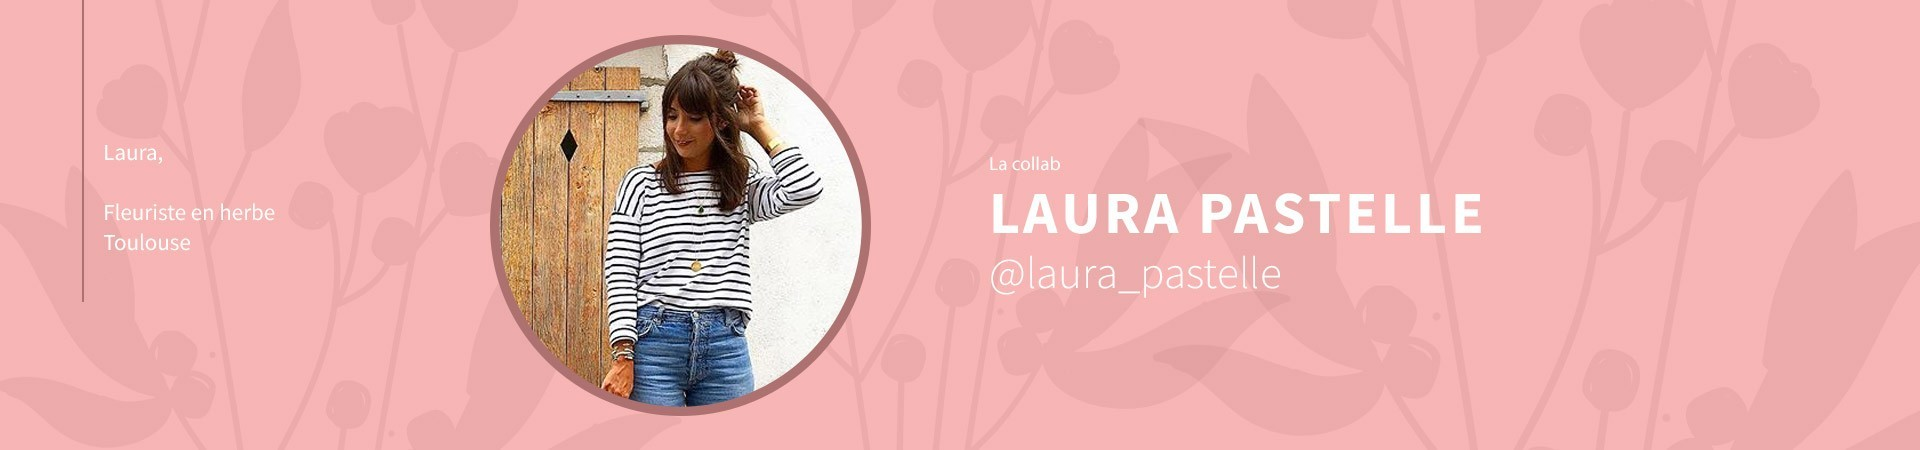 Laura Pastelle